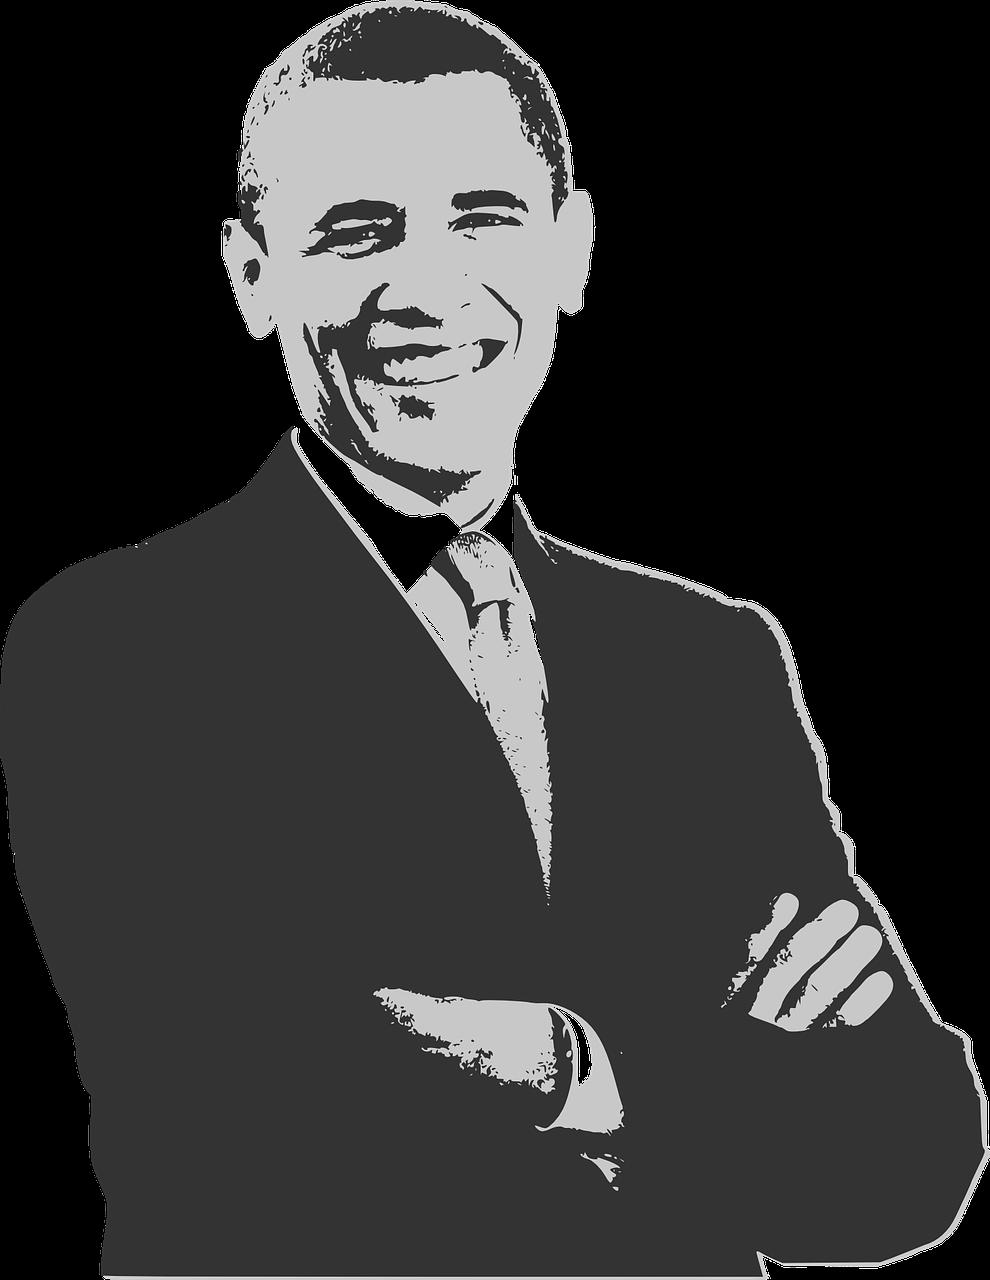 Game theoretic understanding of. Politics clipart president